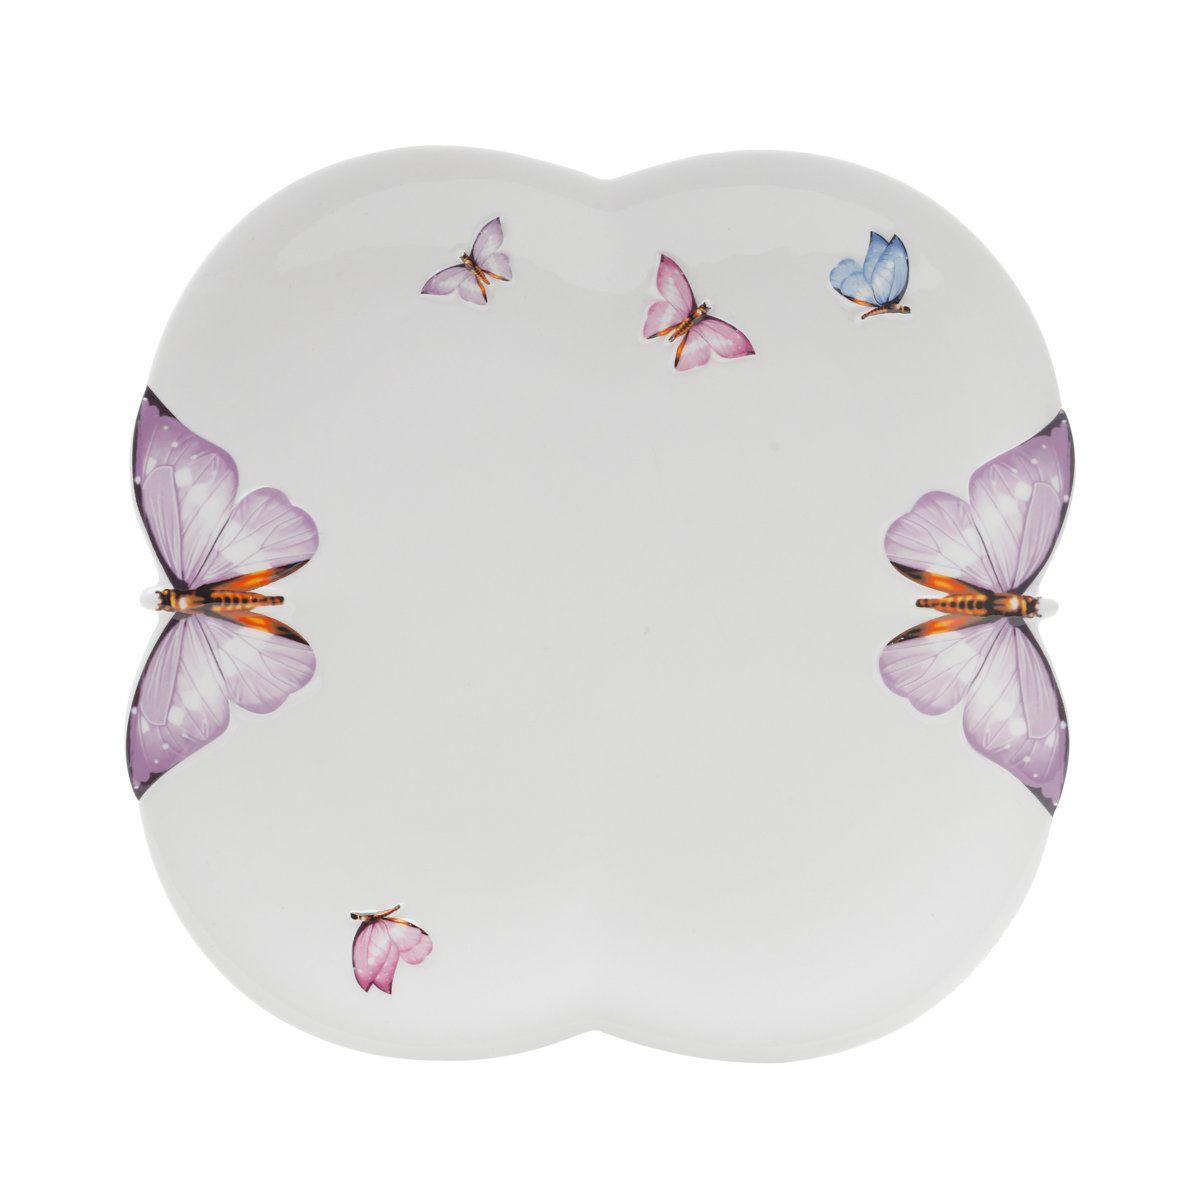 Jogo 6 Sousplats 30,5 cm de porcelana branca Borboletas Wolff - 1170